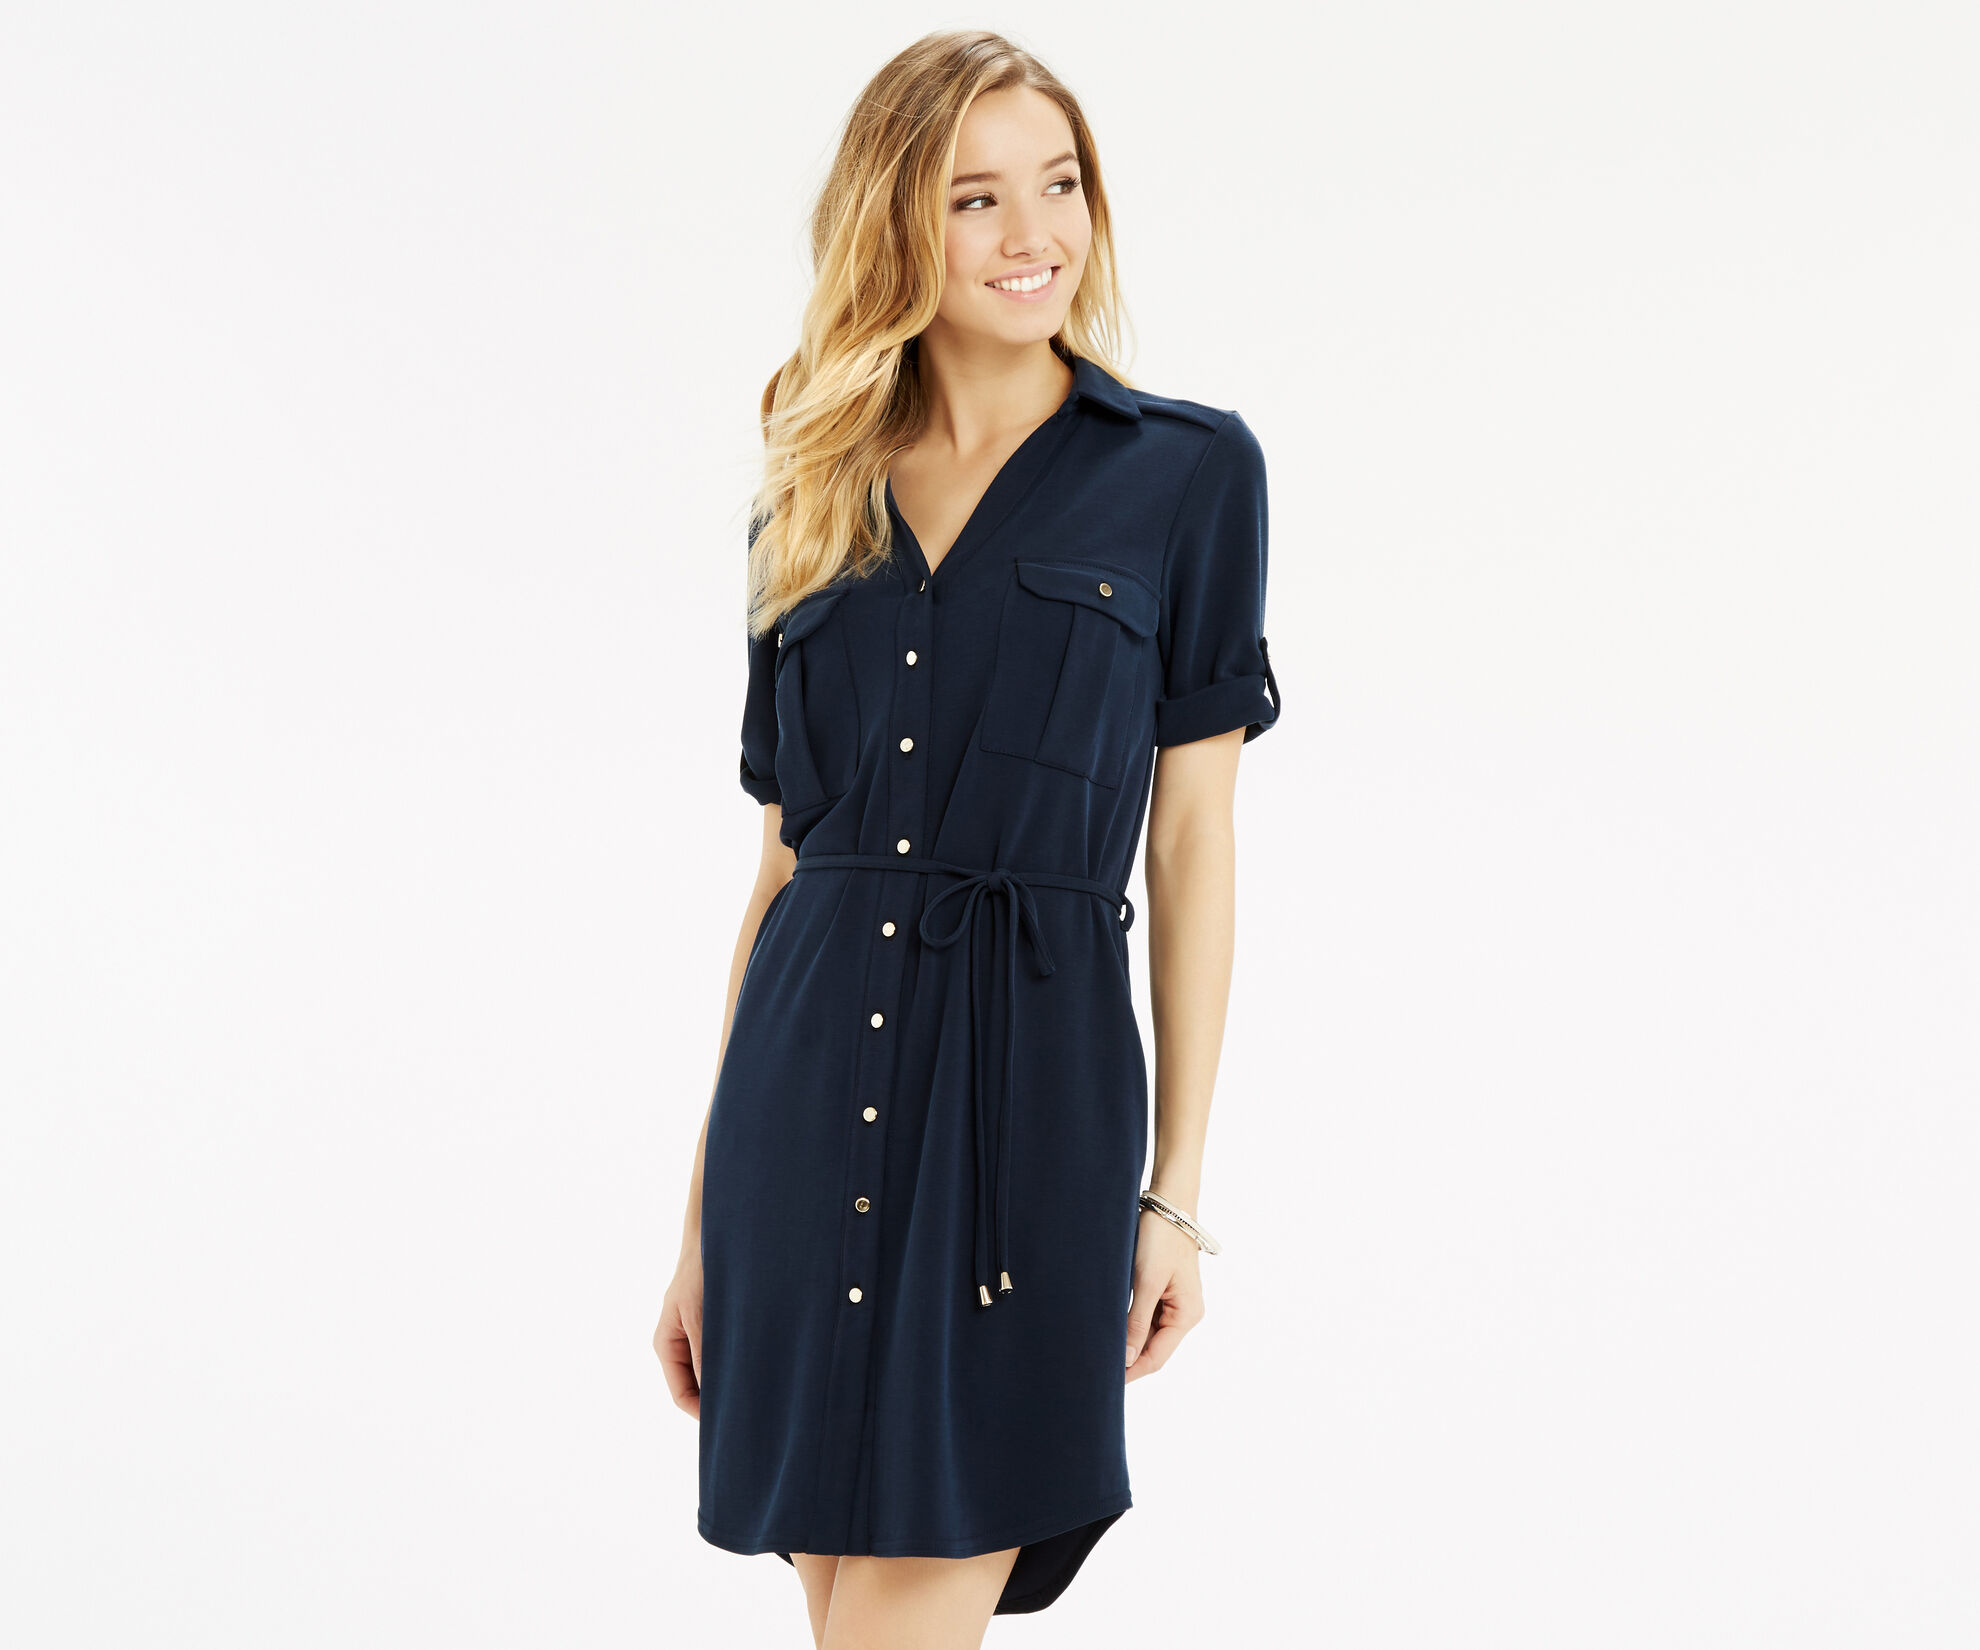 Oasis, Textured Shirt Dress Navy 1